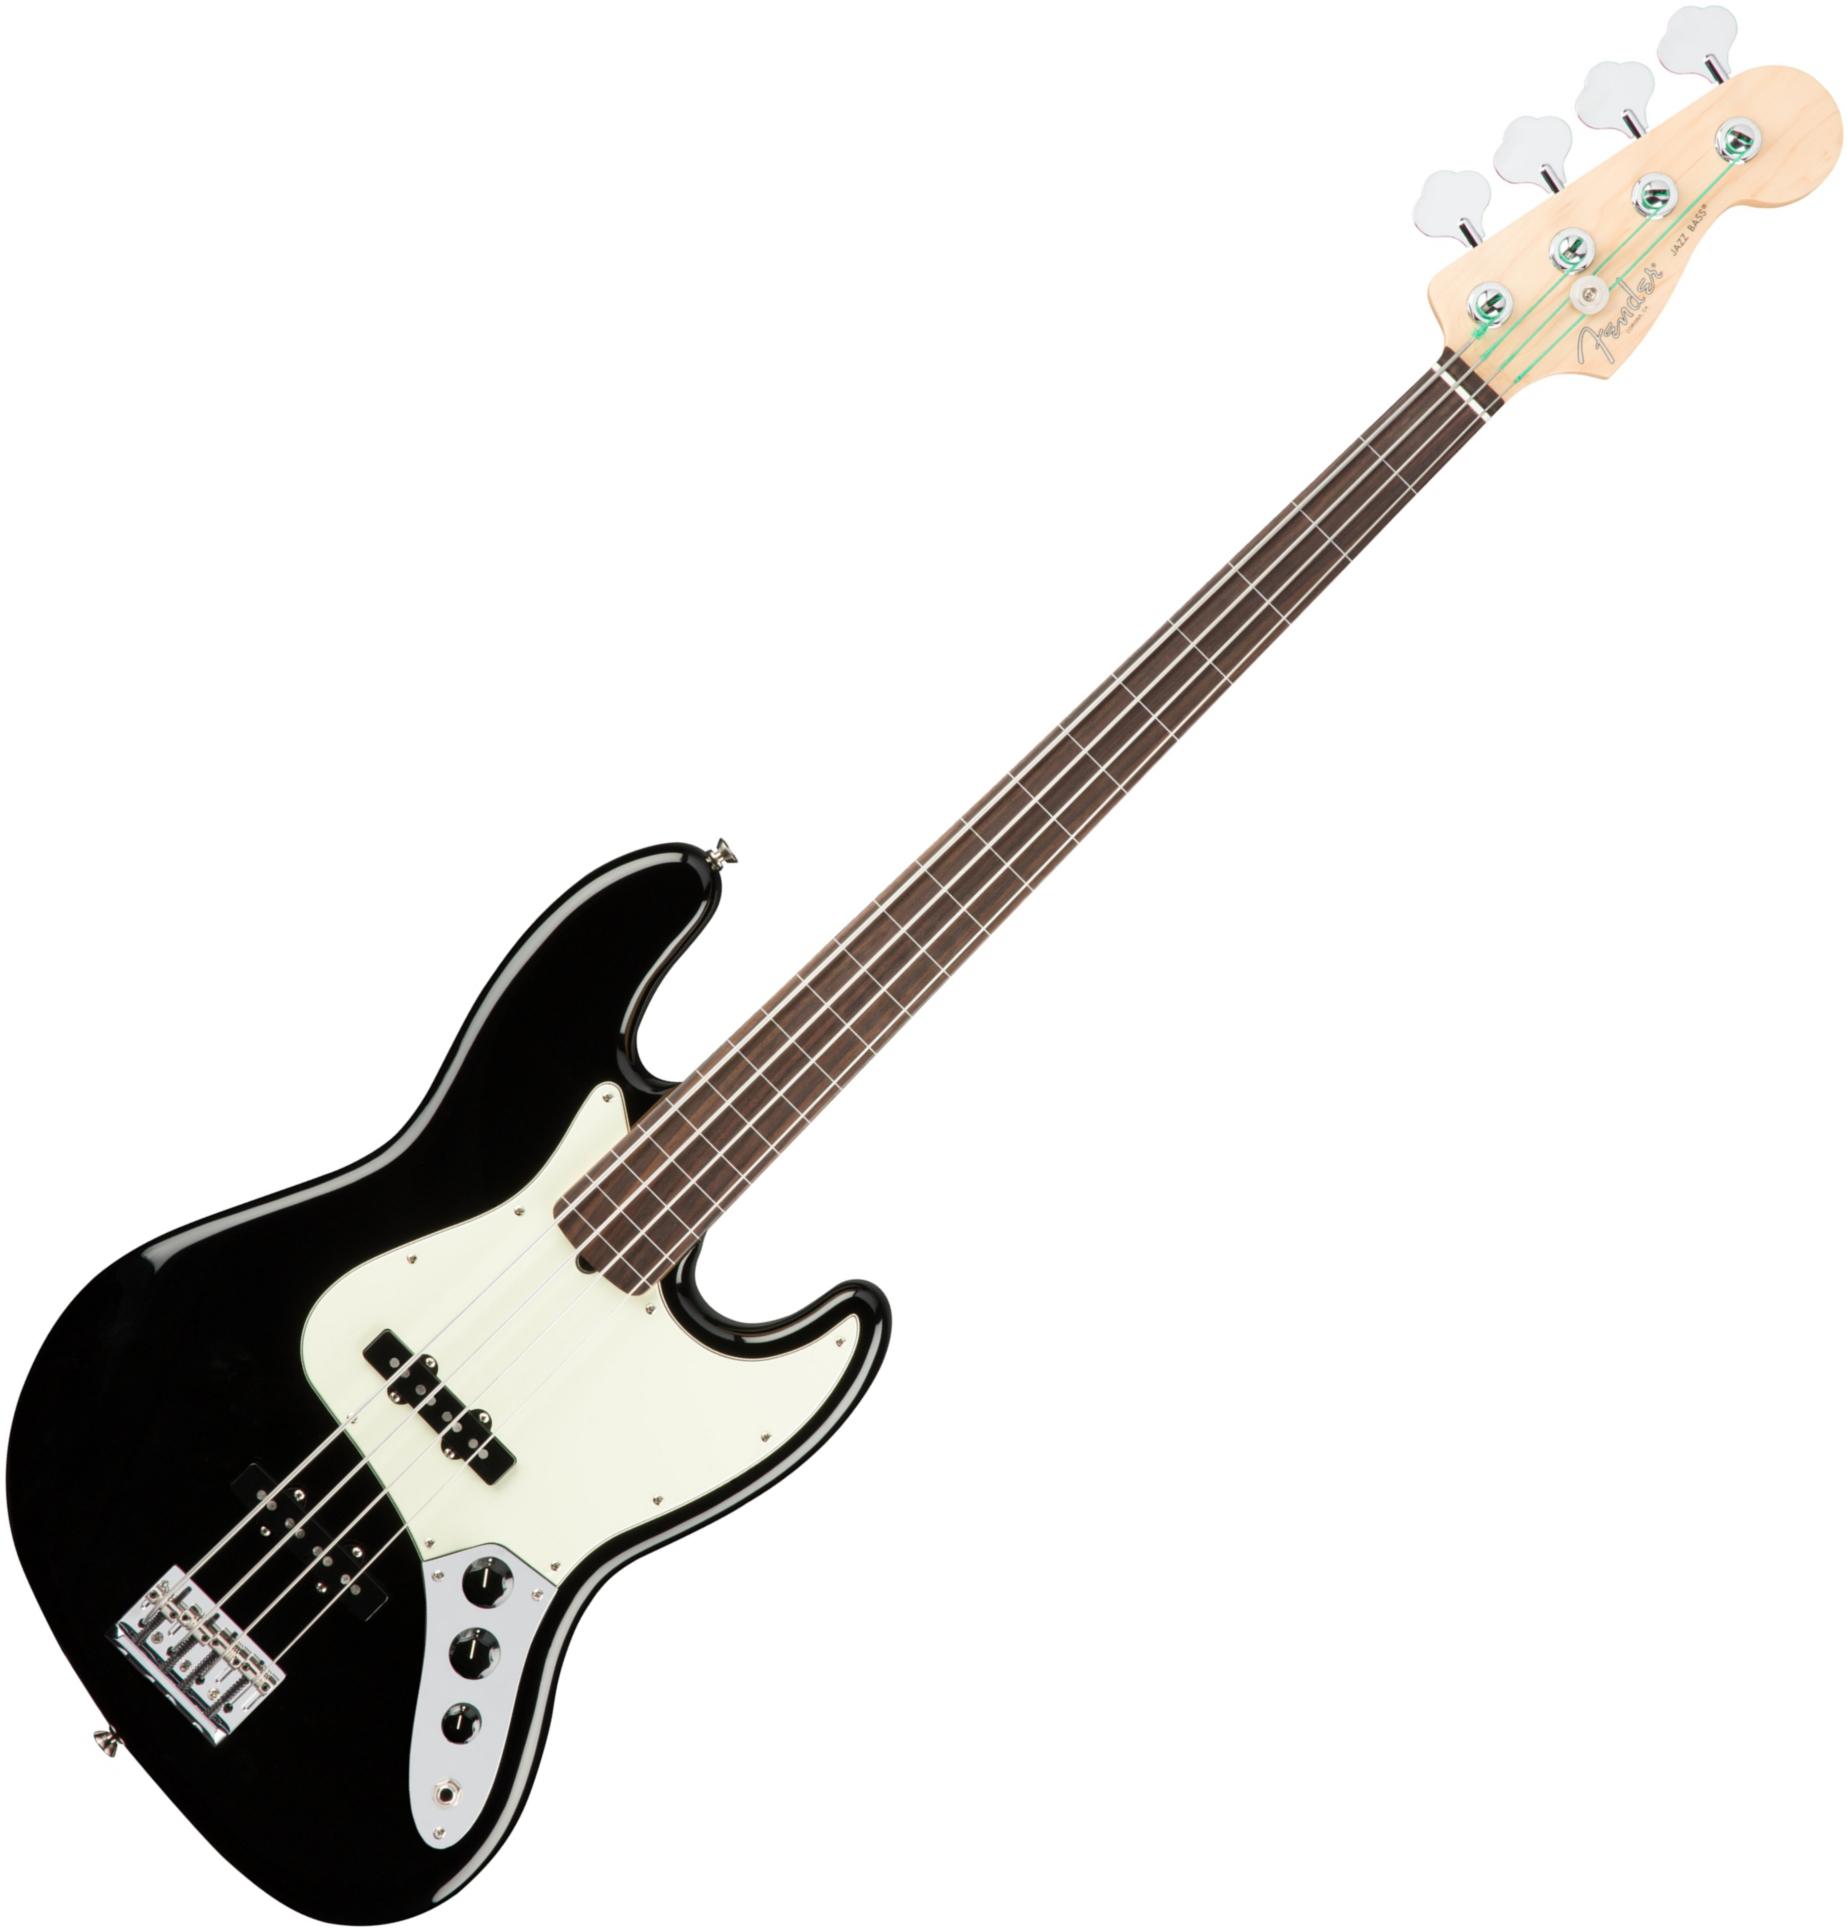 Jeu de cordes basses FENDER 990L guitare basse 45 à 90 pur nickel